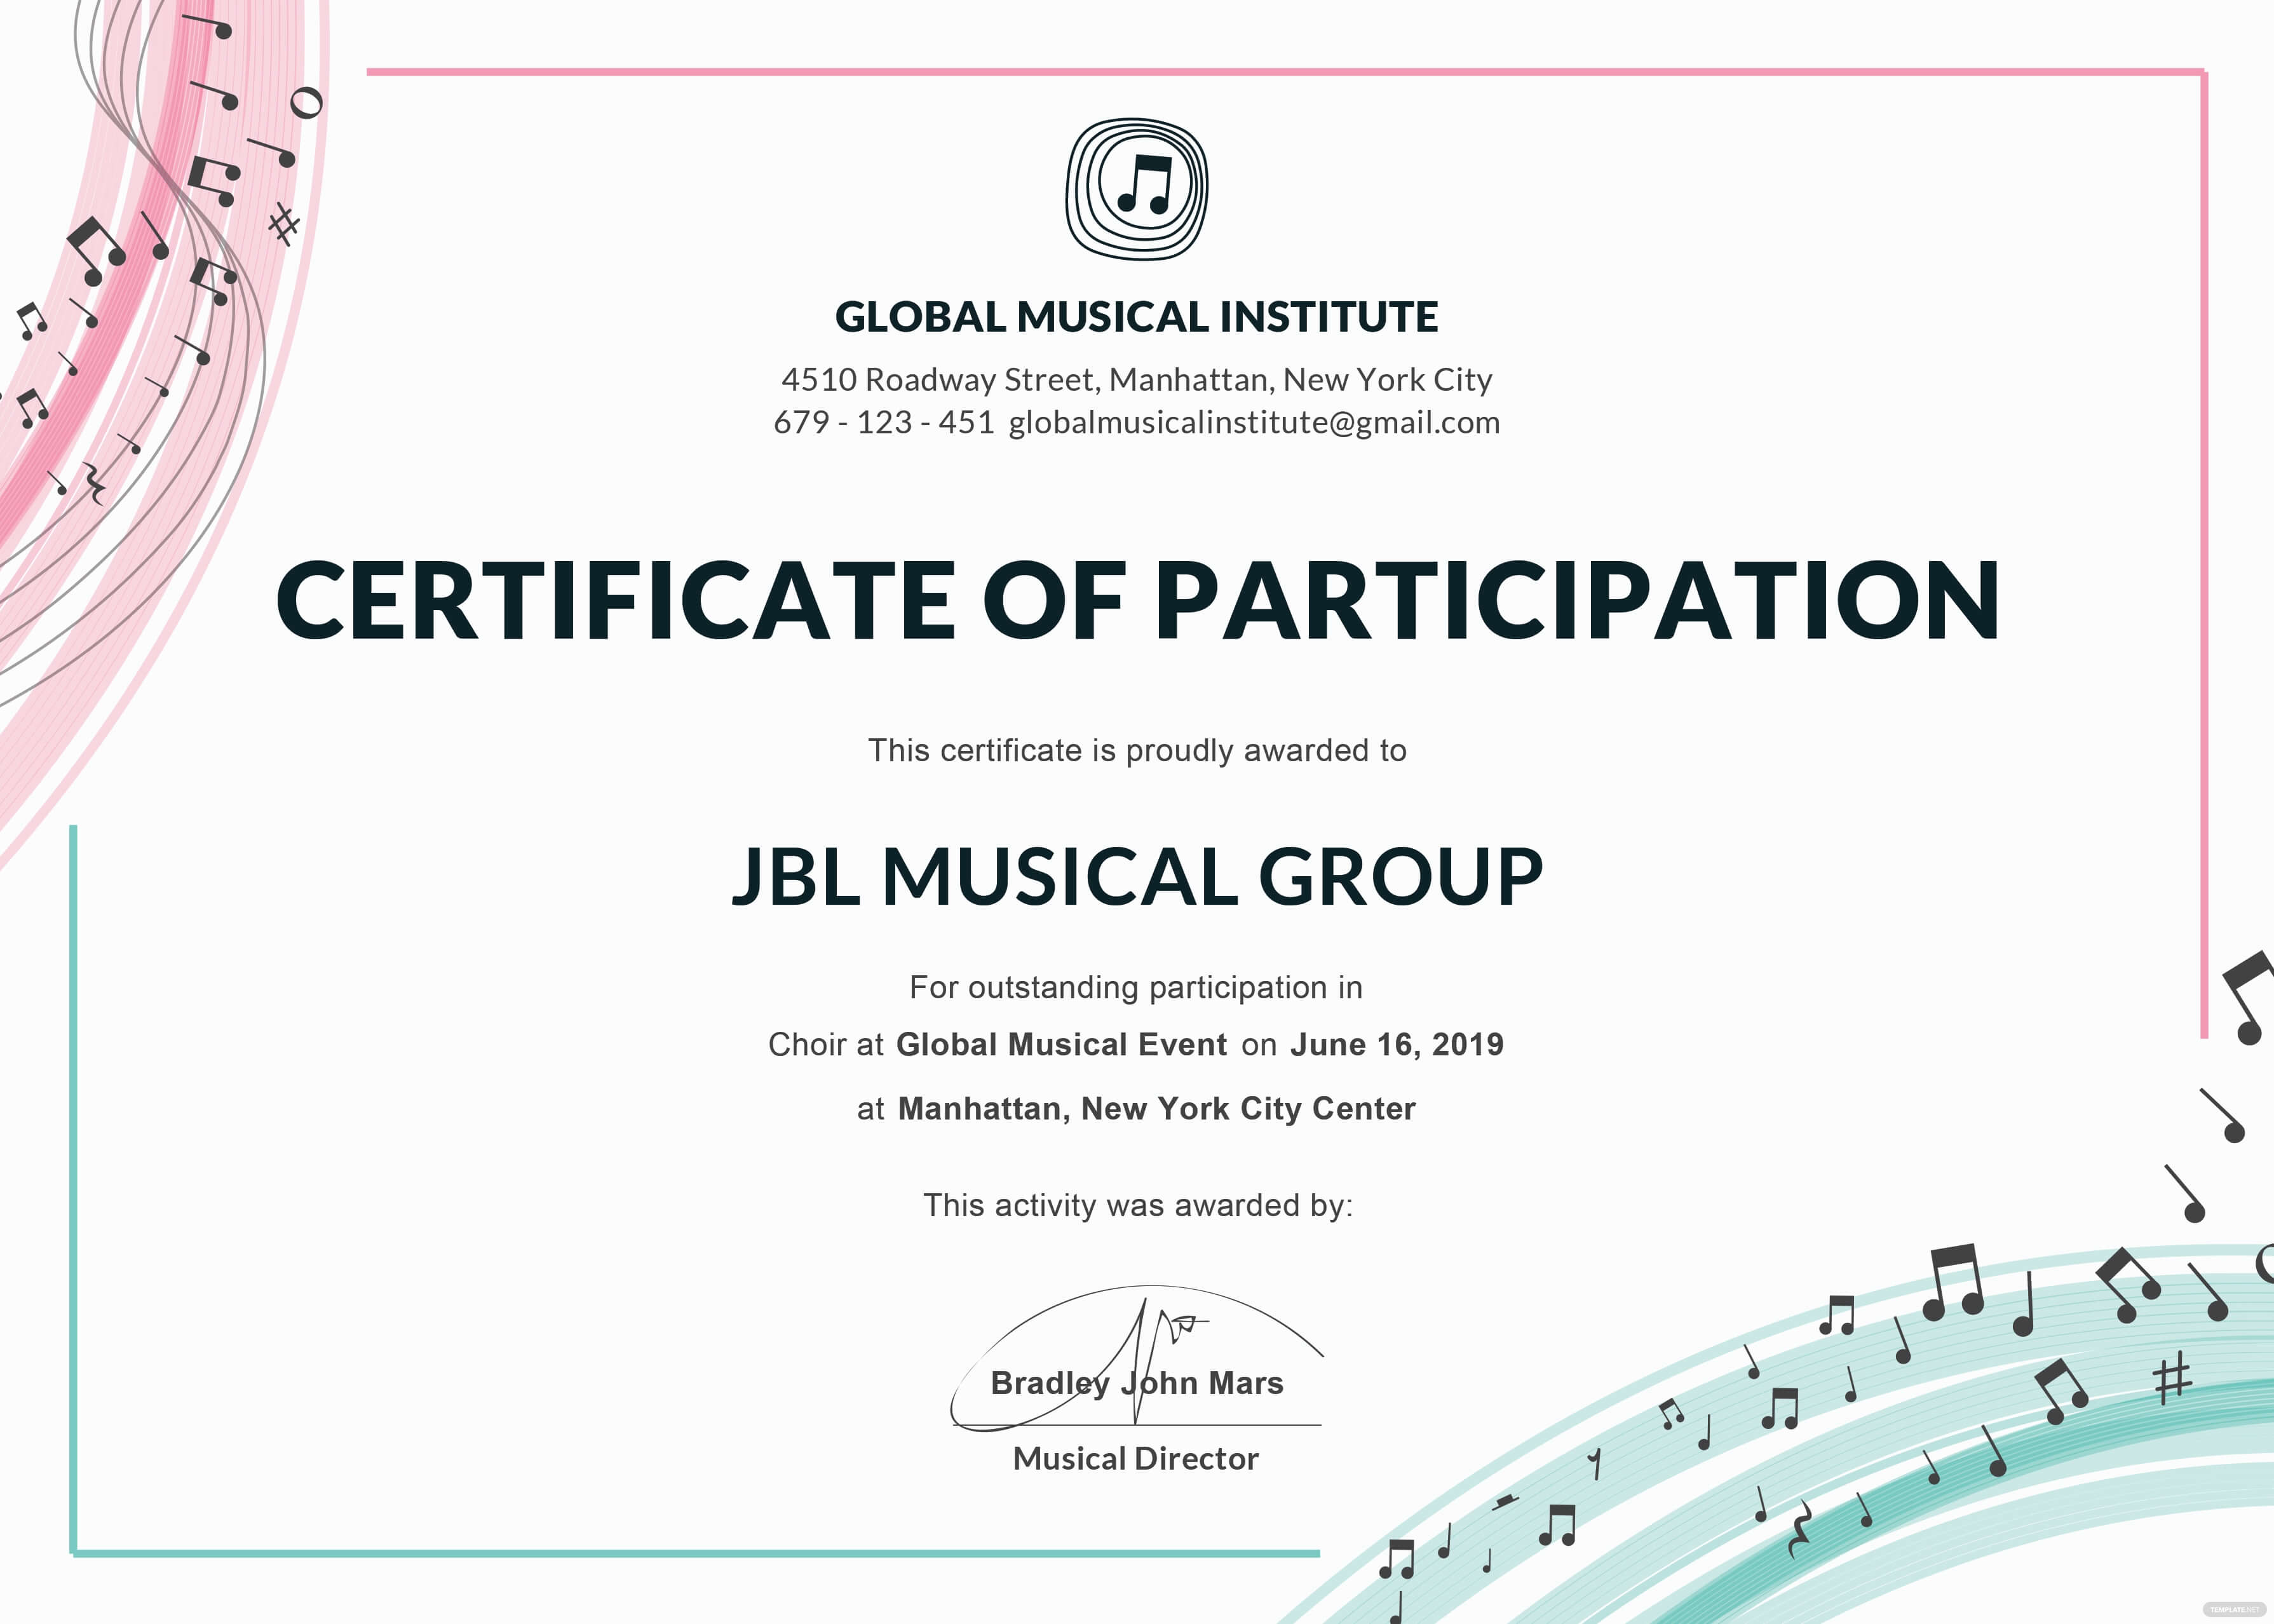 Certificate Templates: Certificate Of Participation, Format In Templates For Certificates Of Participation